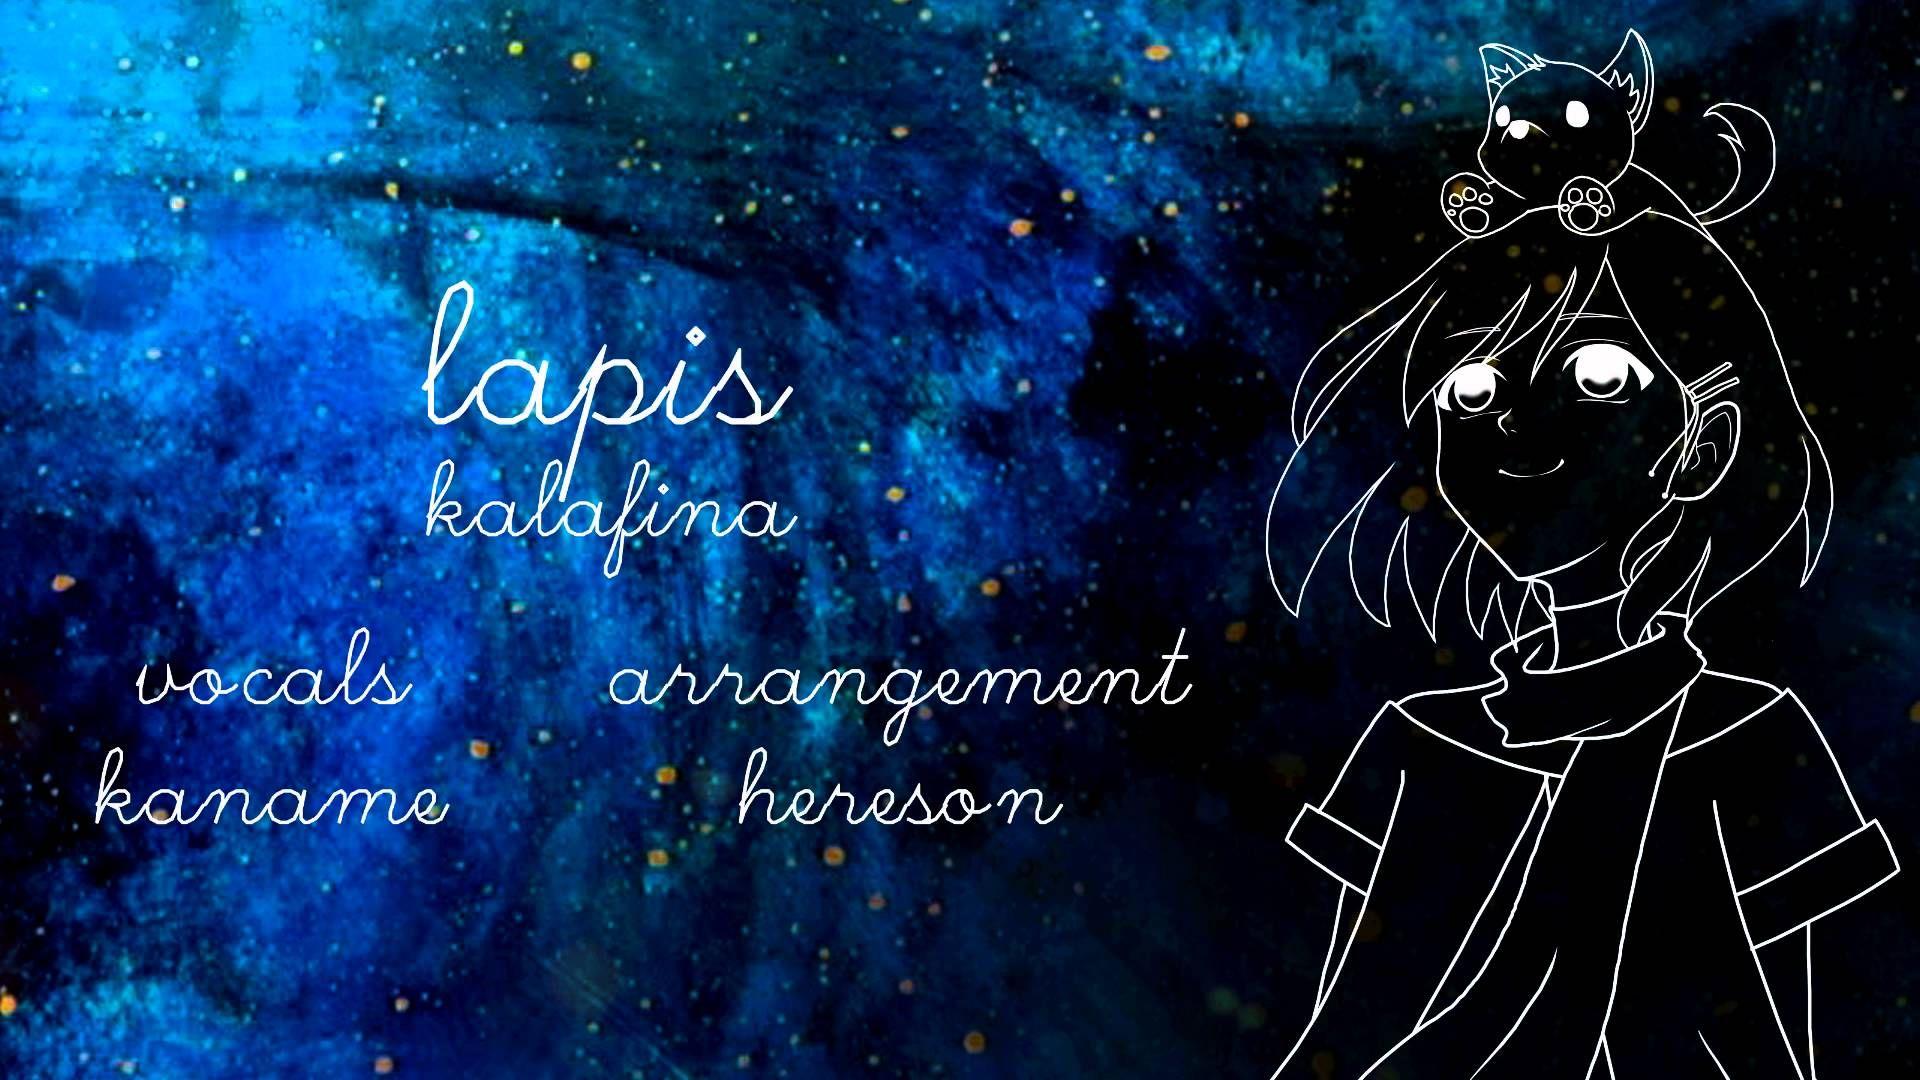 『KanaChi x Hereson』 Lapis ~ Kalafina